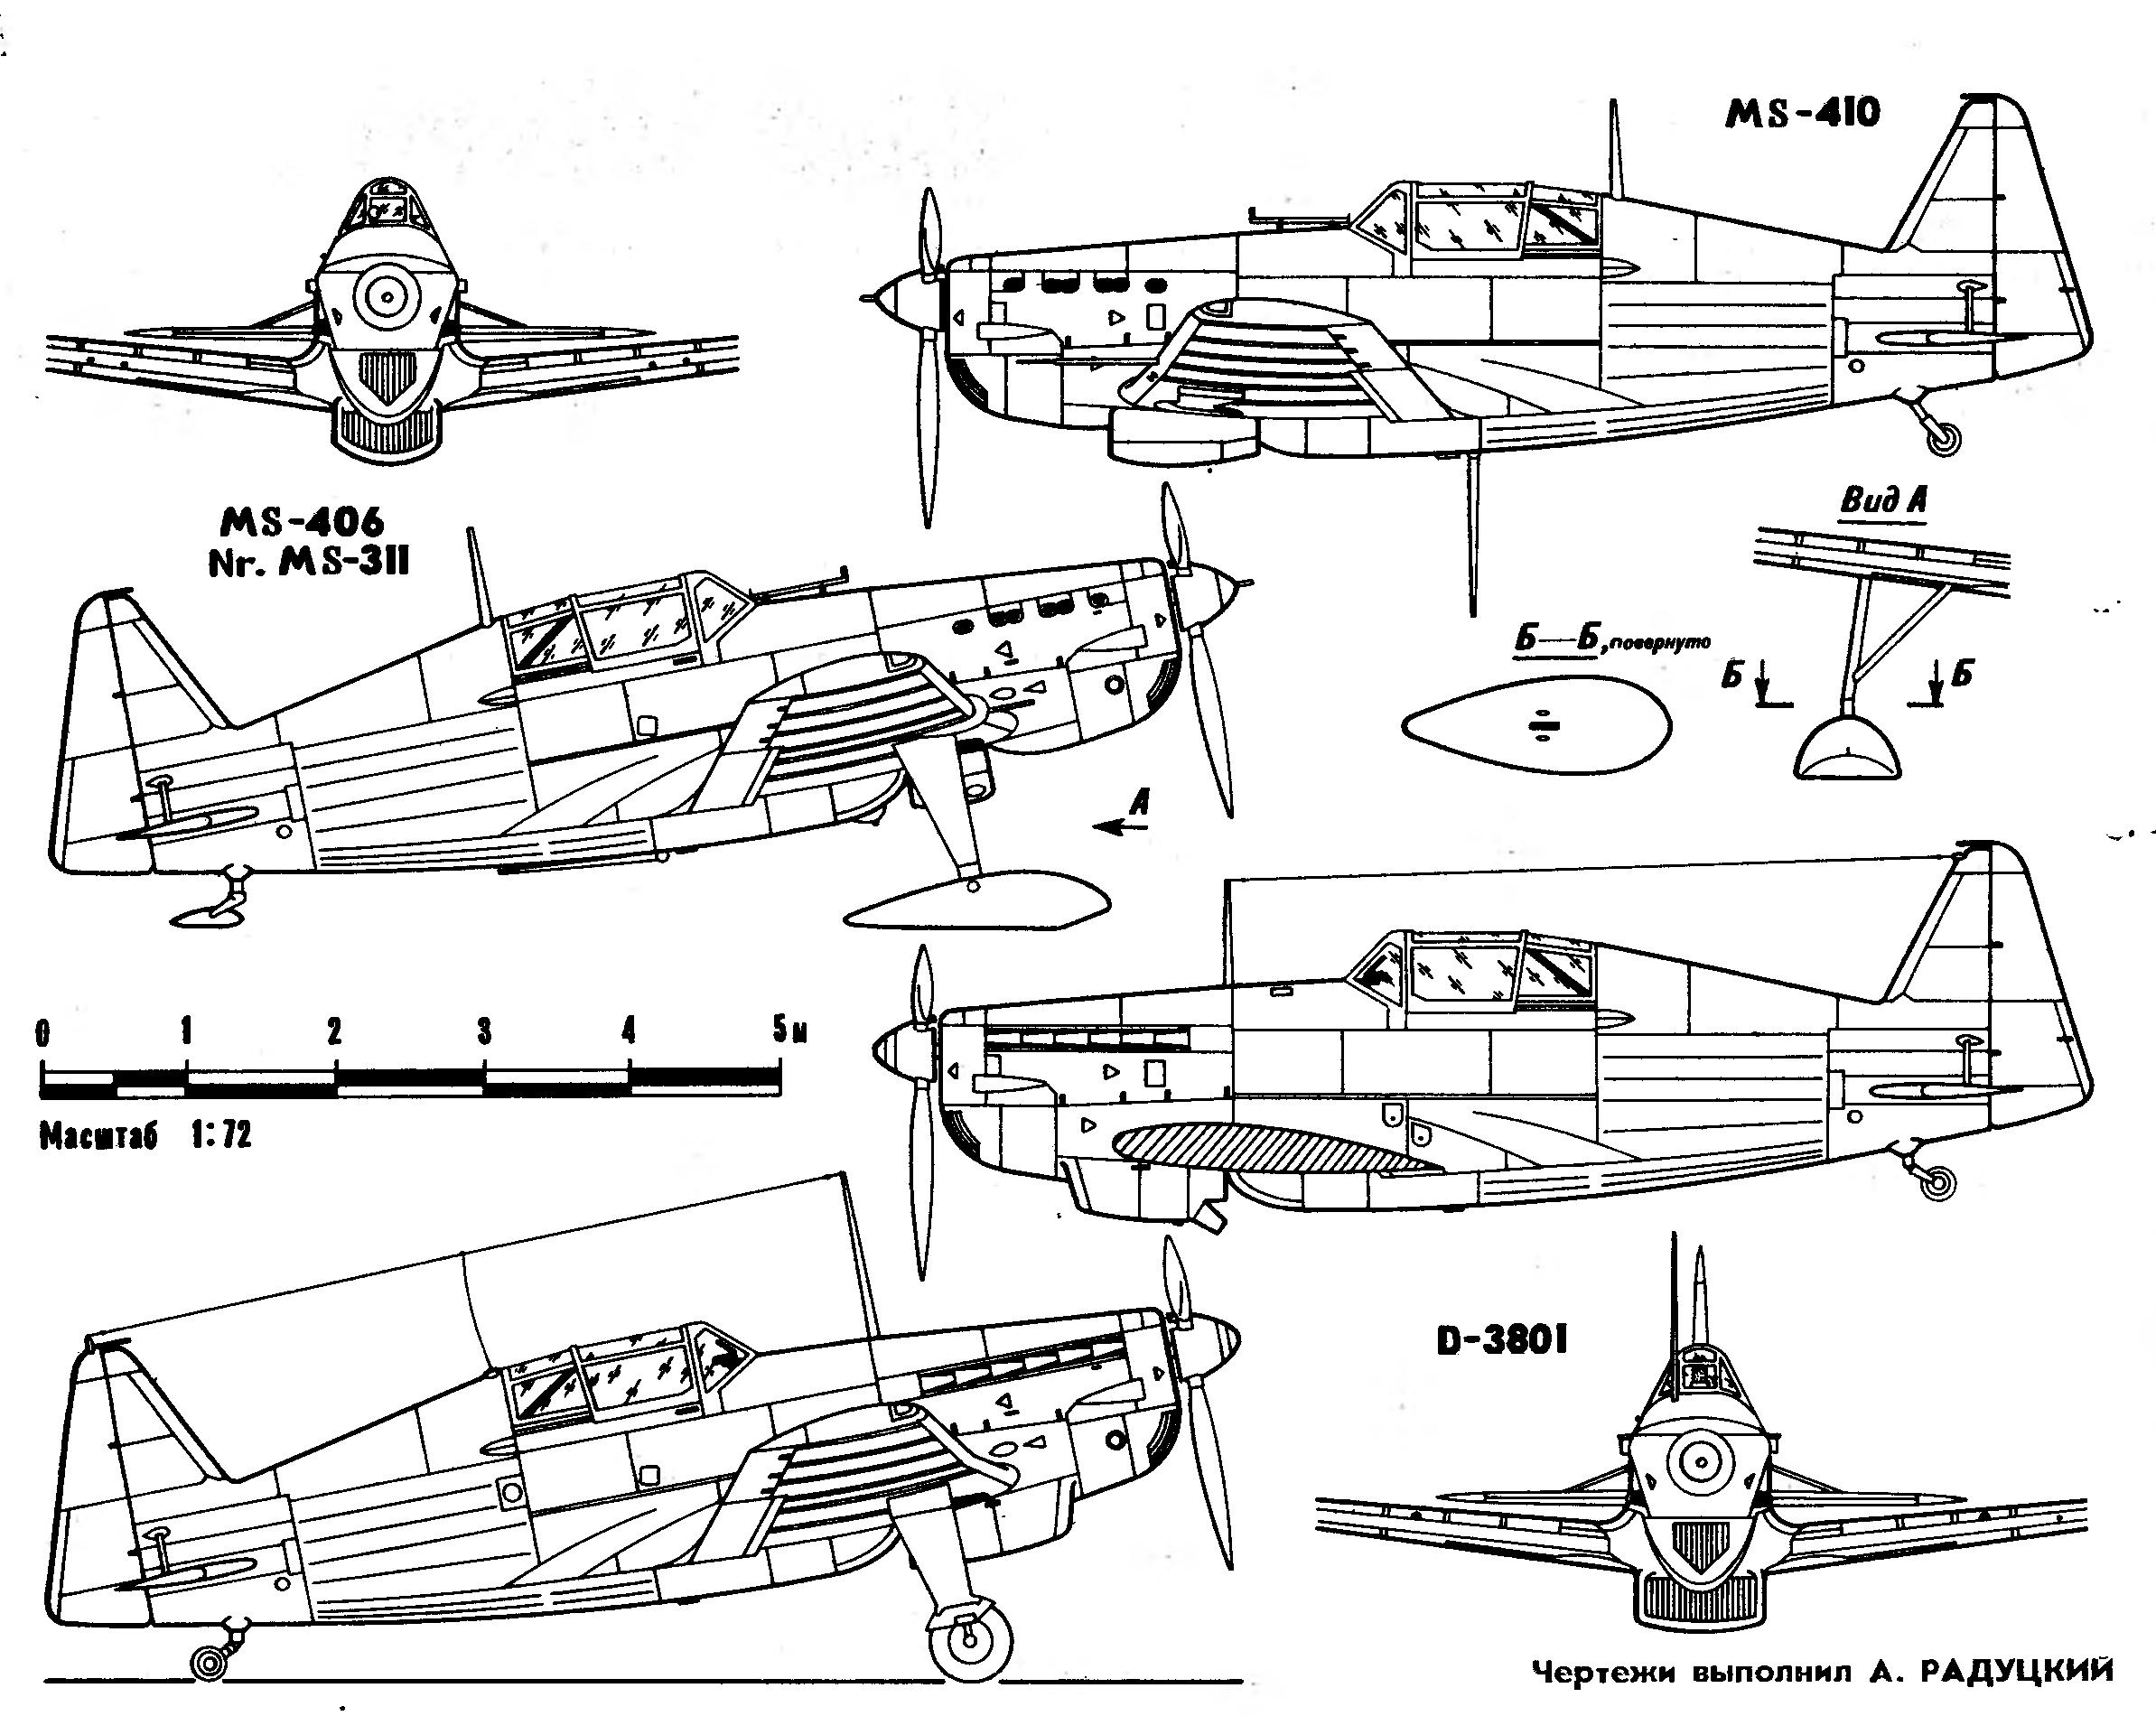 Morane-Saulnier M.S.406 variants:MS-406.Nr.MS-311. MS-410